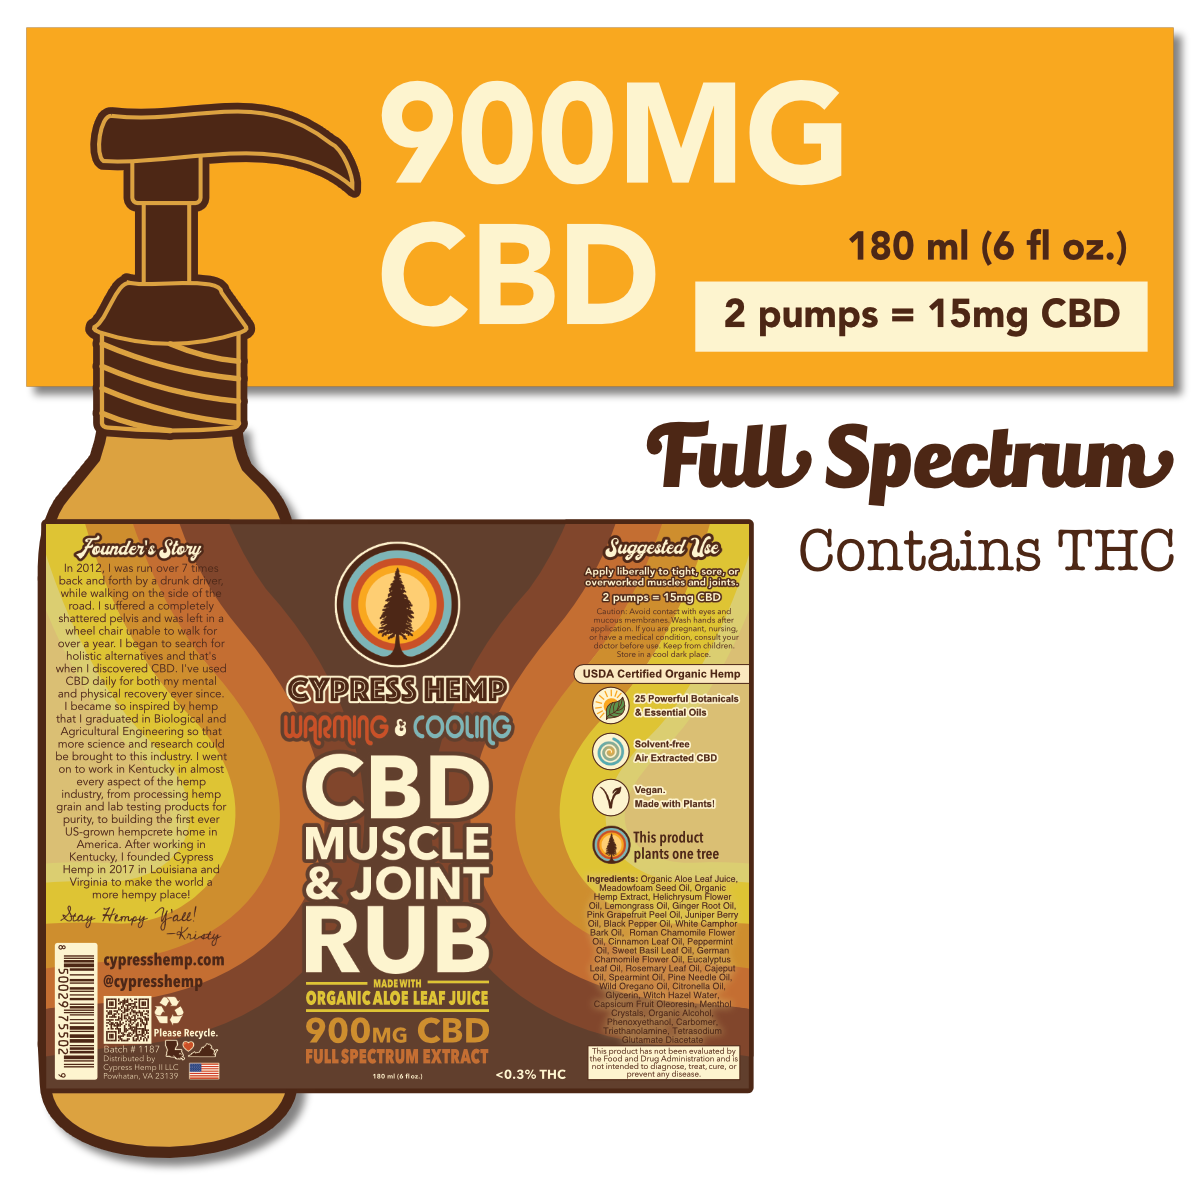 Cypress Hemp Full Spectrum 900mg CBD Muscle & Joint Rub